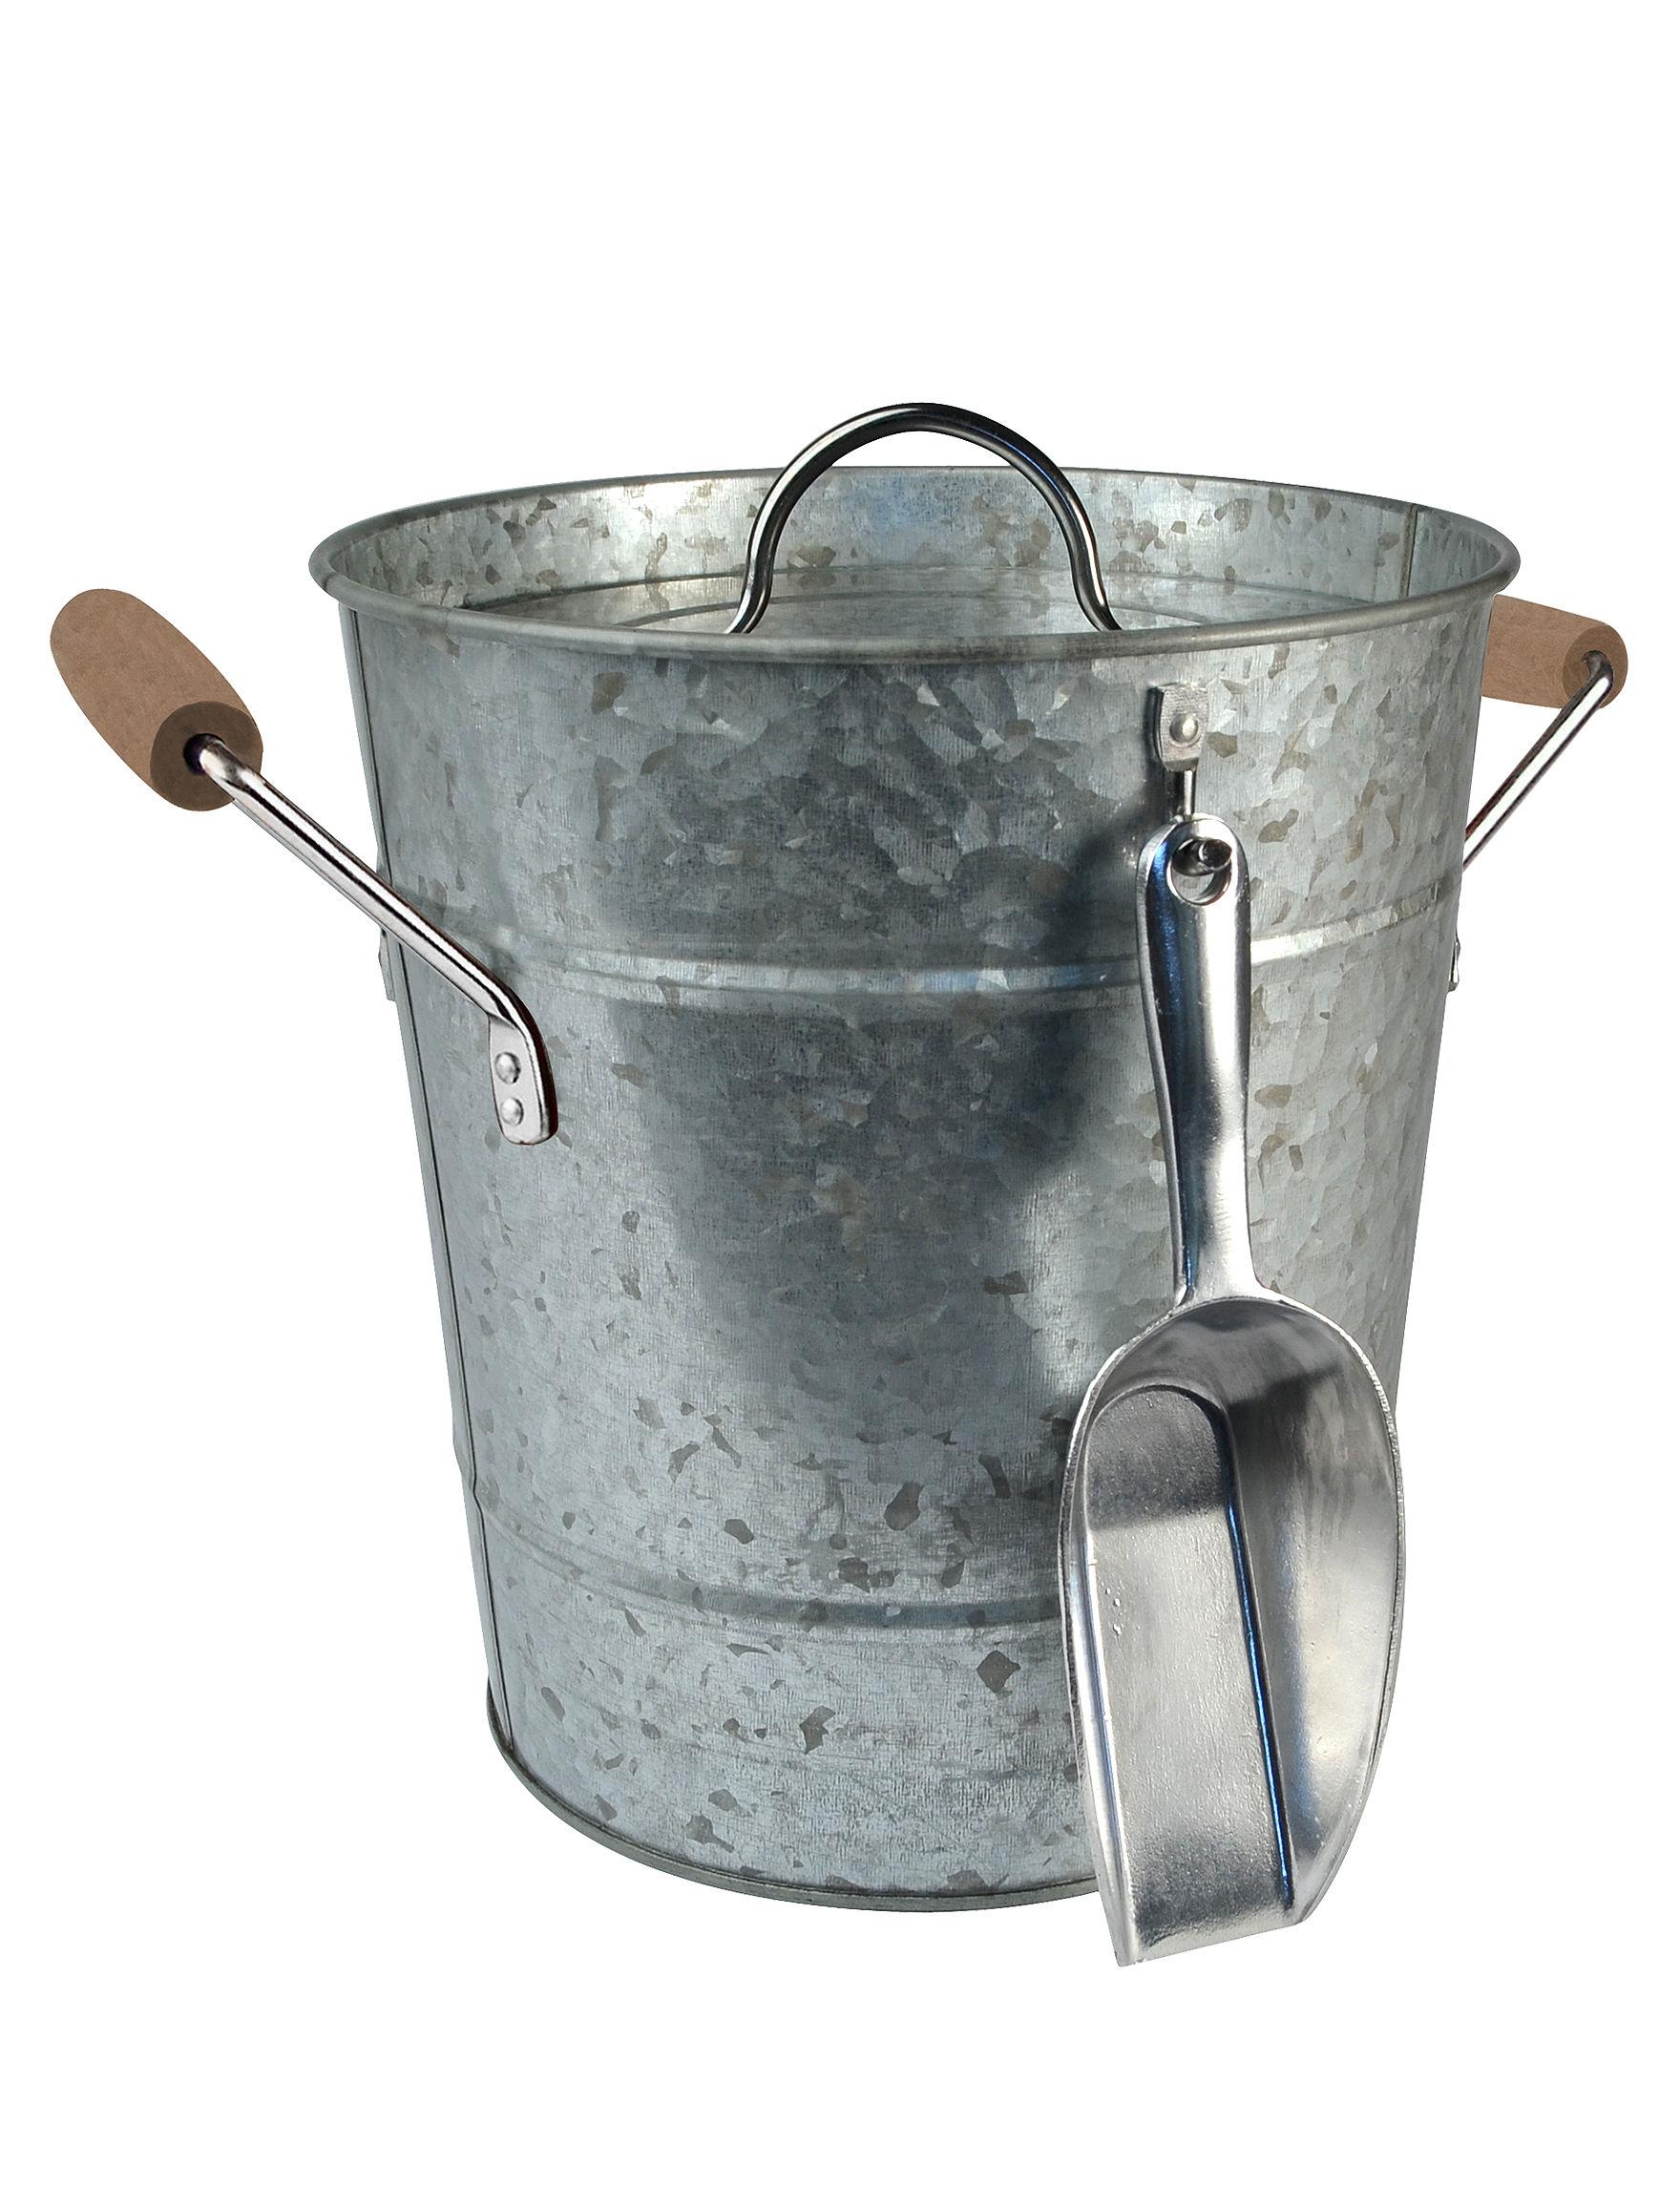 Artland Steel Ice Buckets Serveware